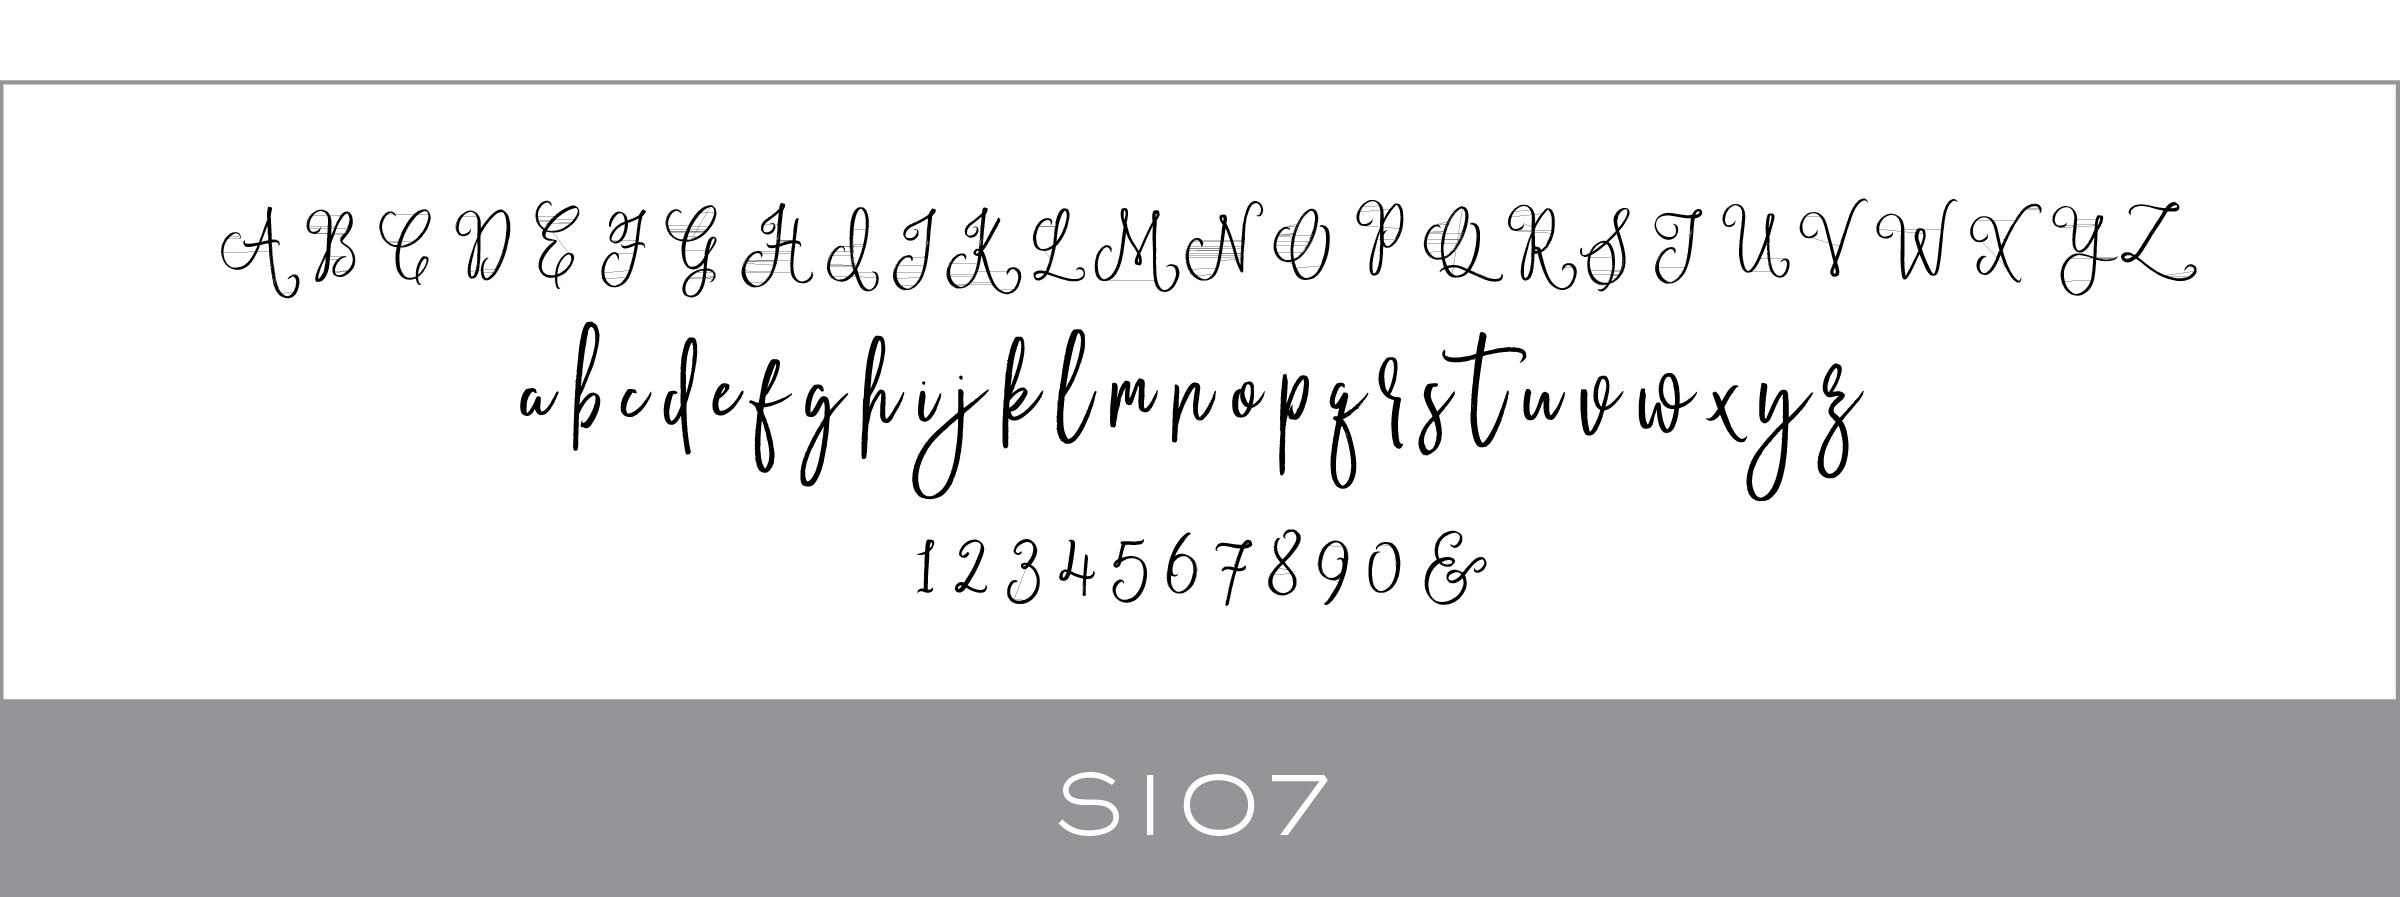 S107_Haute_Papier_Font.jpg